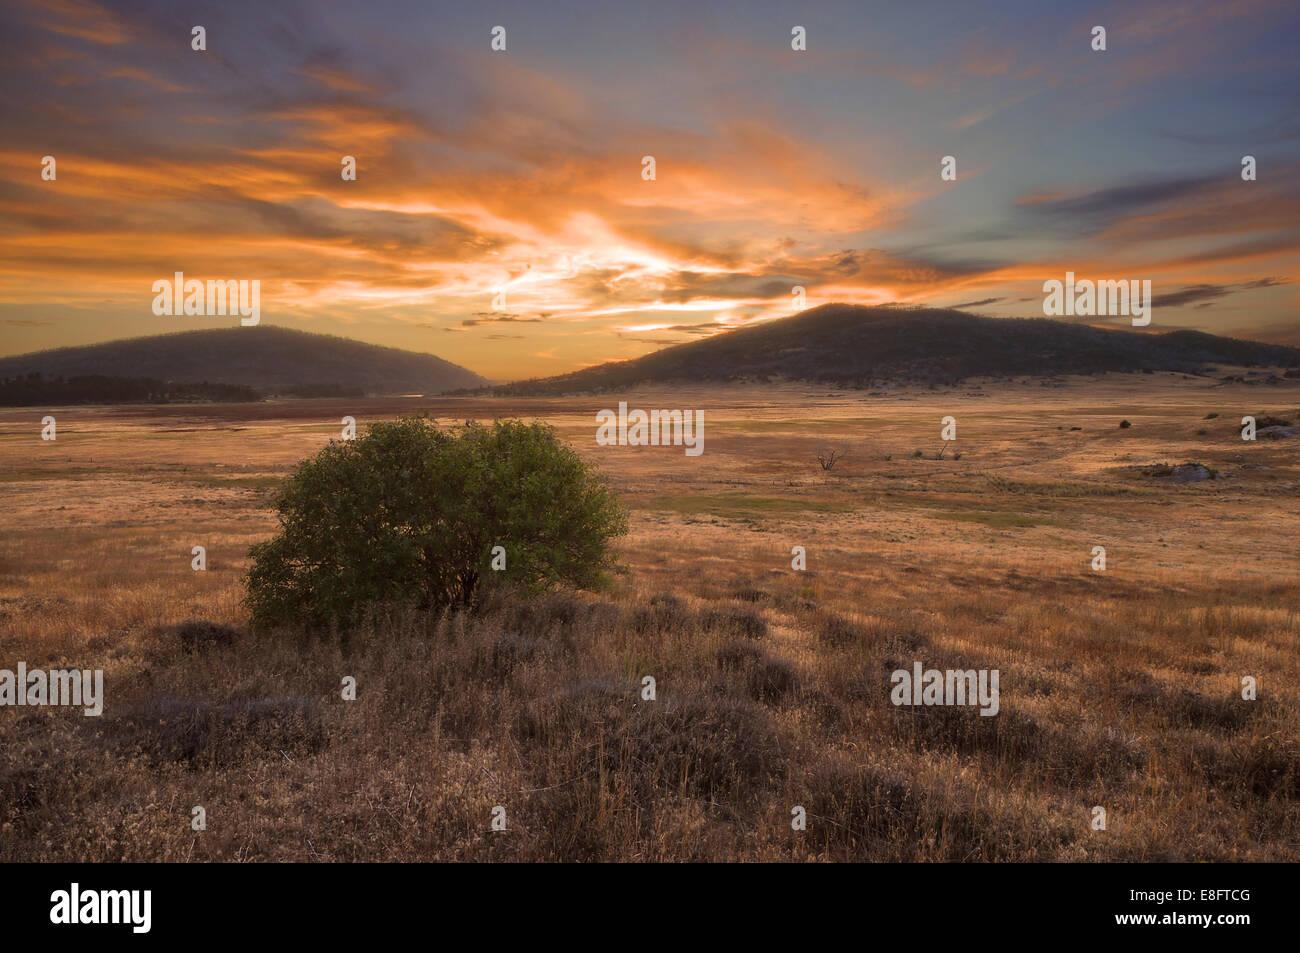 USA, California, Cuyamaca Rancho State Park at sunset - Stock Image